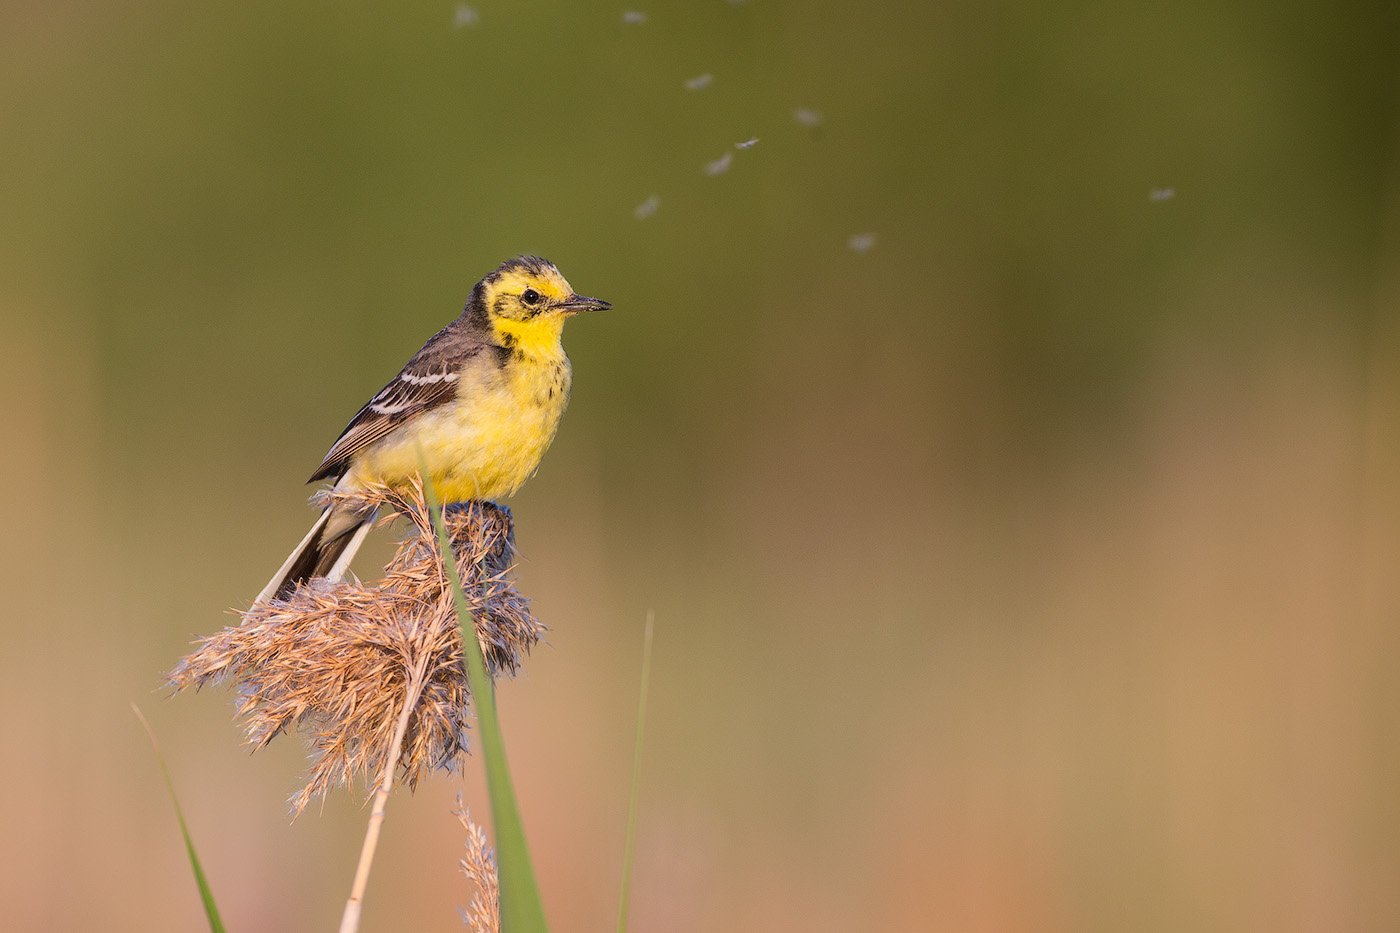 wagtail, bird, wildlife, citrine, трясогузка, желтая трясогузка, птицы, дикая природа, Голубев Дмитрий